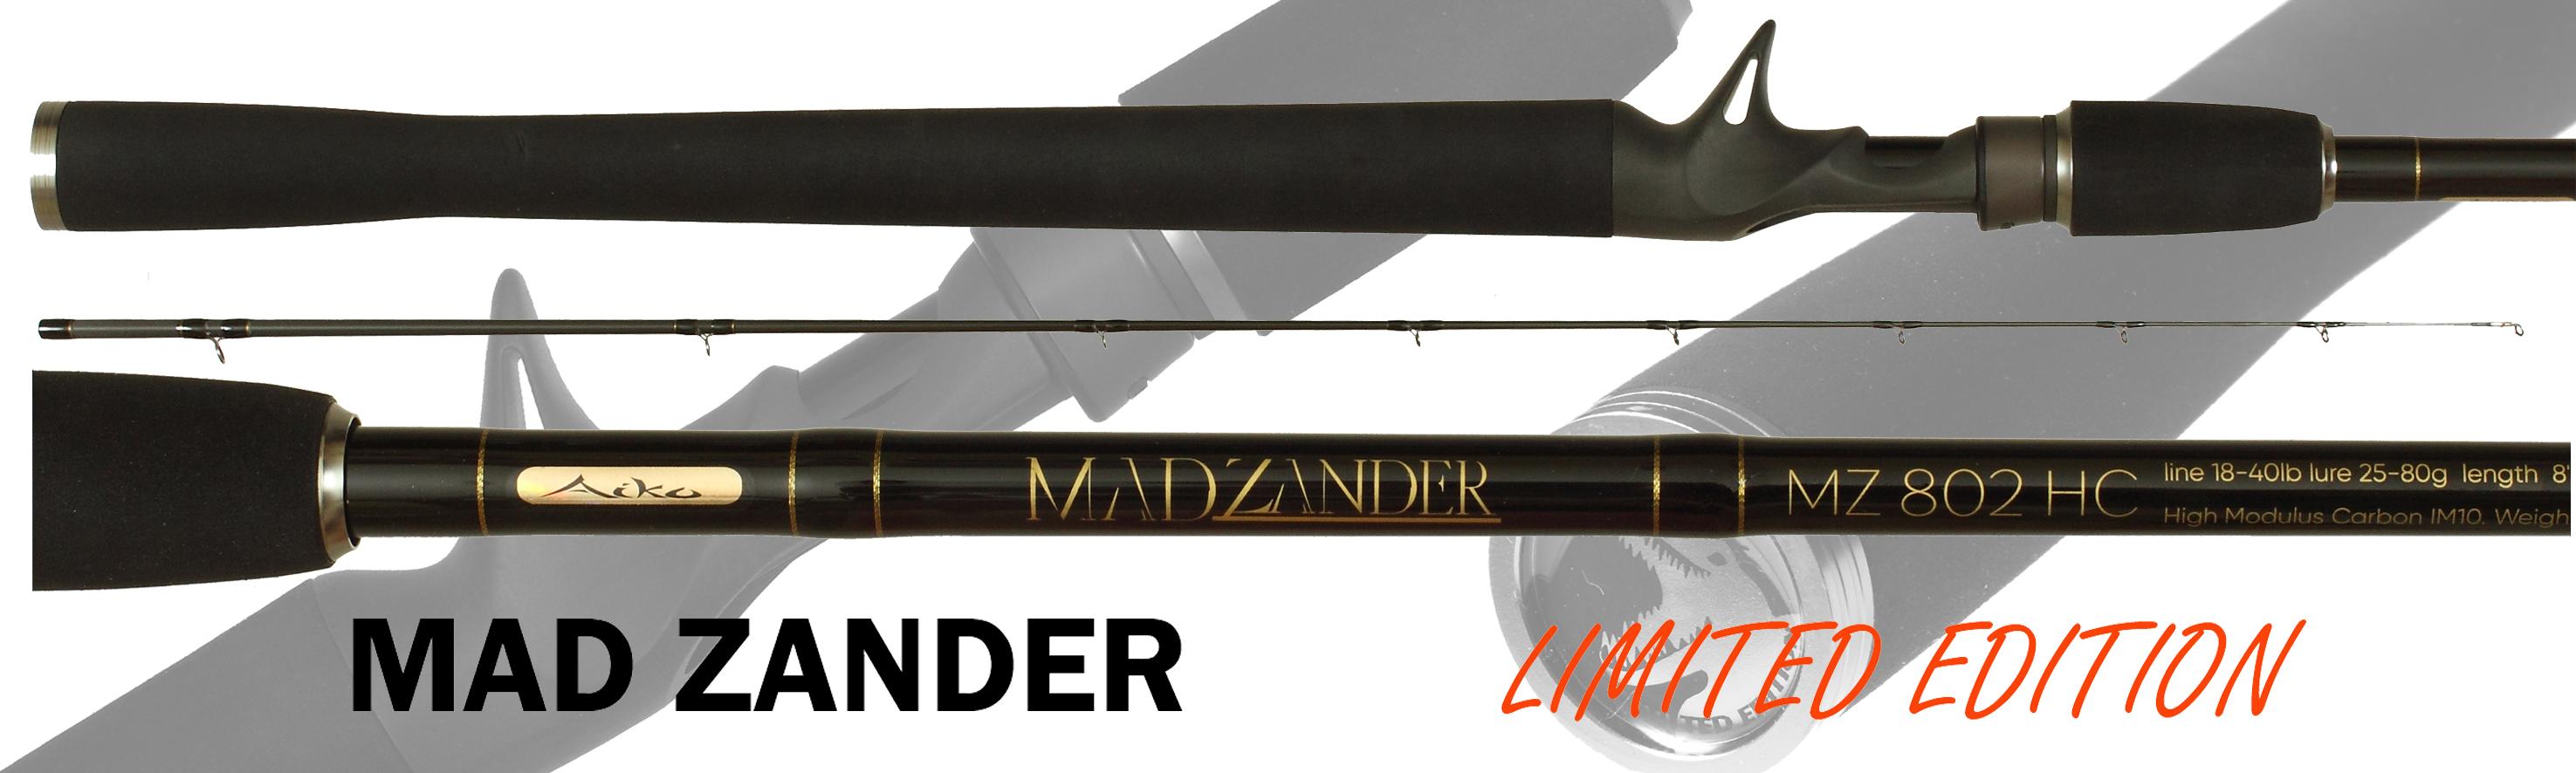 Mad Zander 1